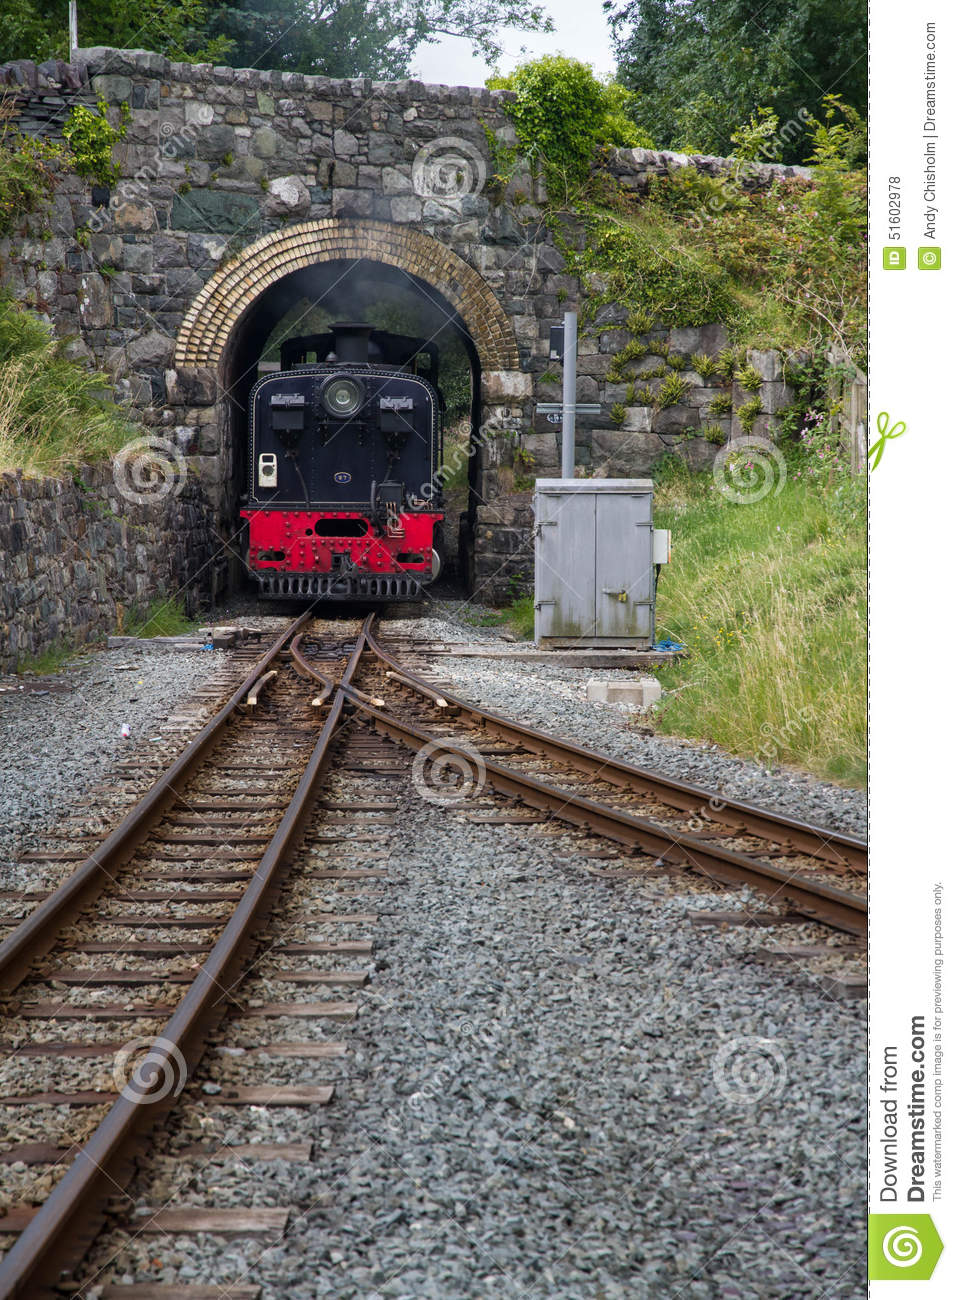 Welsh Highland Narrow Gauge Railway. Steam Locomotive Approaches.